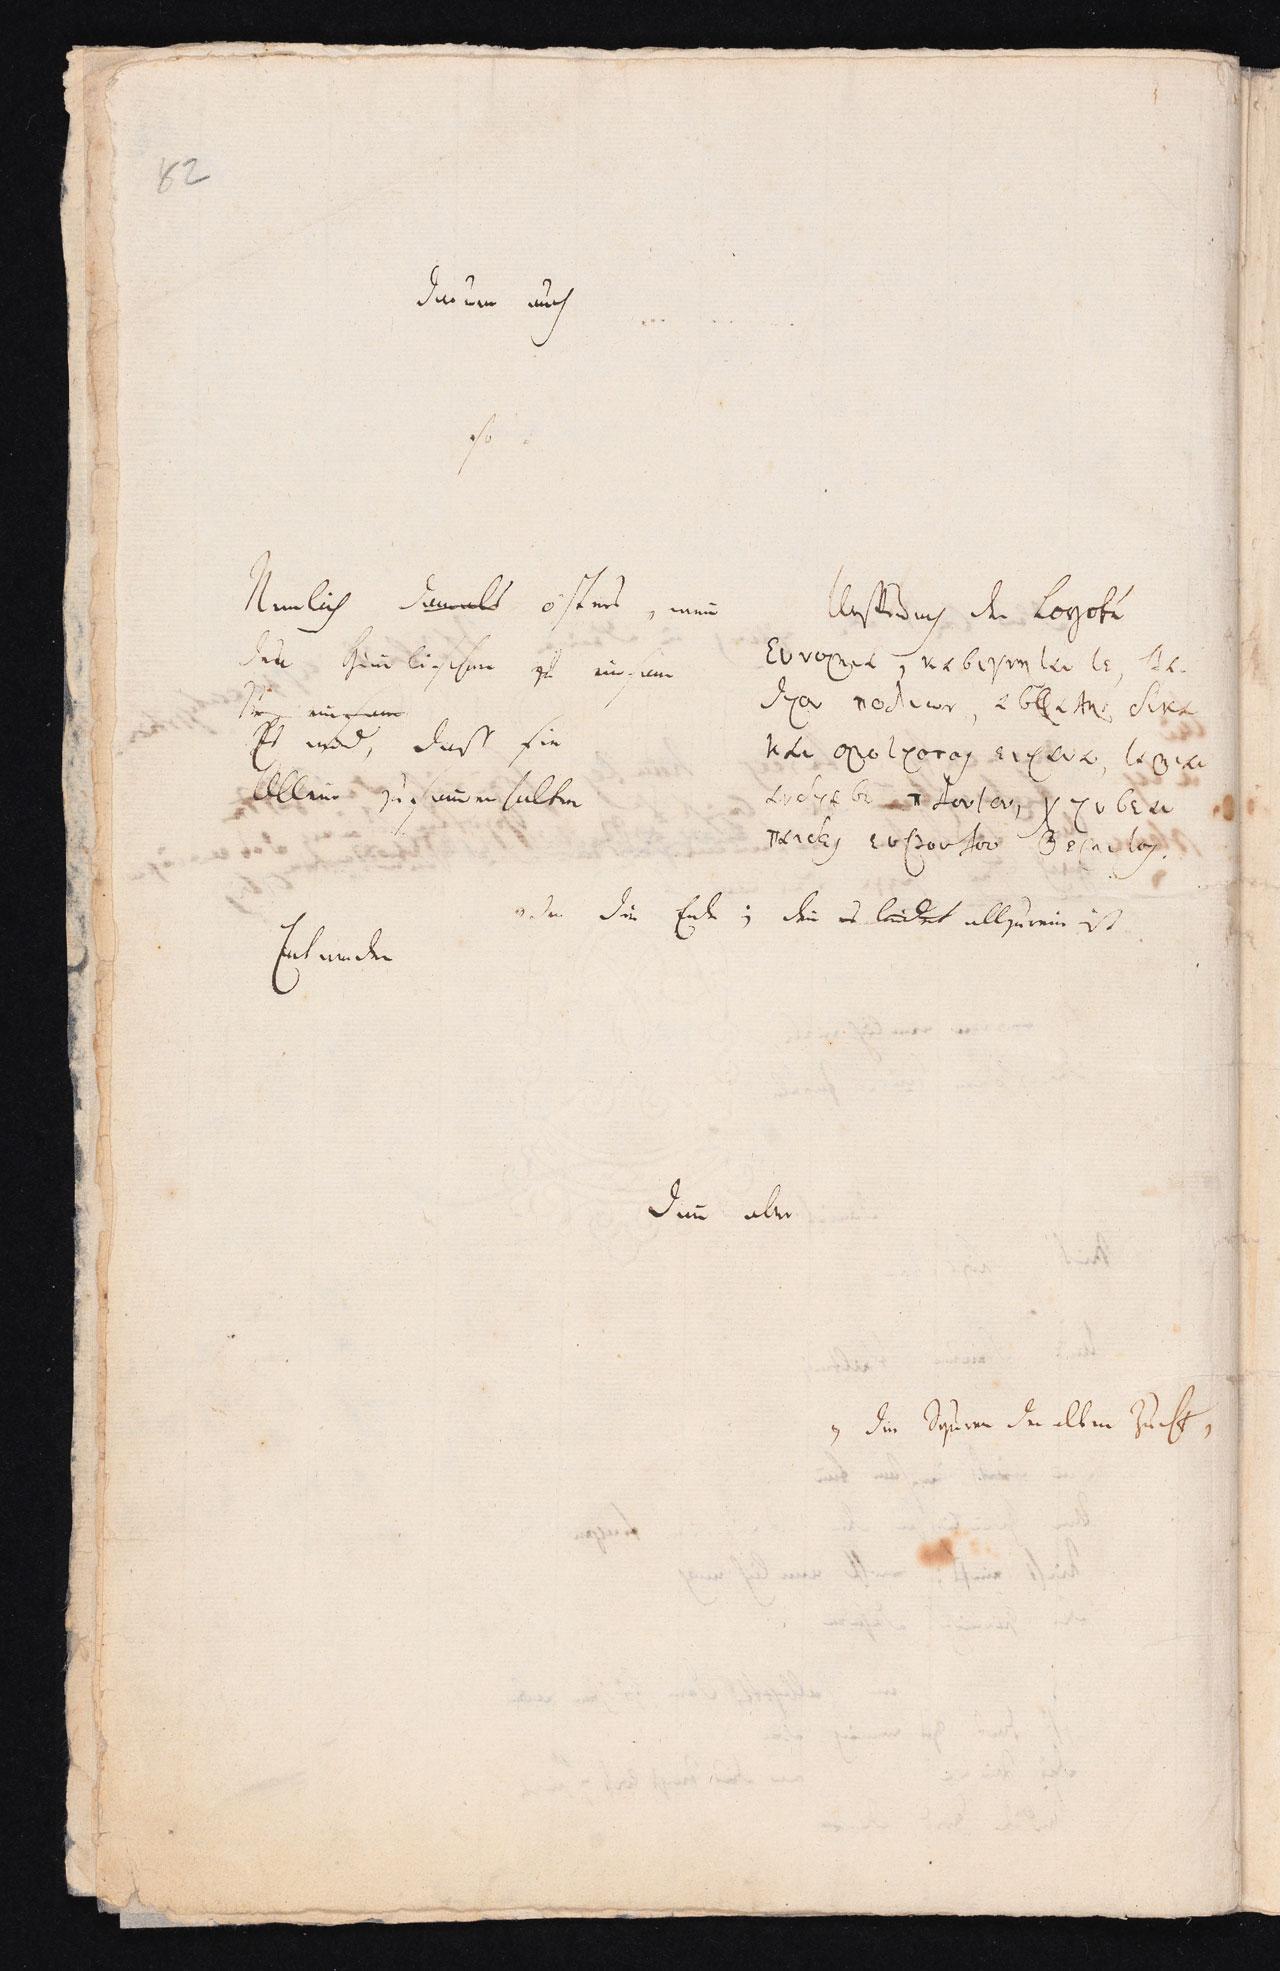 Friedrich Hölderlin, Homburger Folioheft, Seite 82, Kolomb, Handschrift